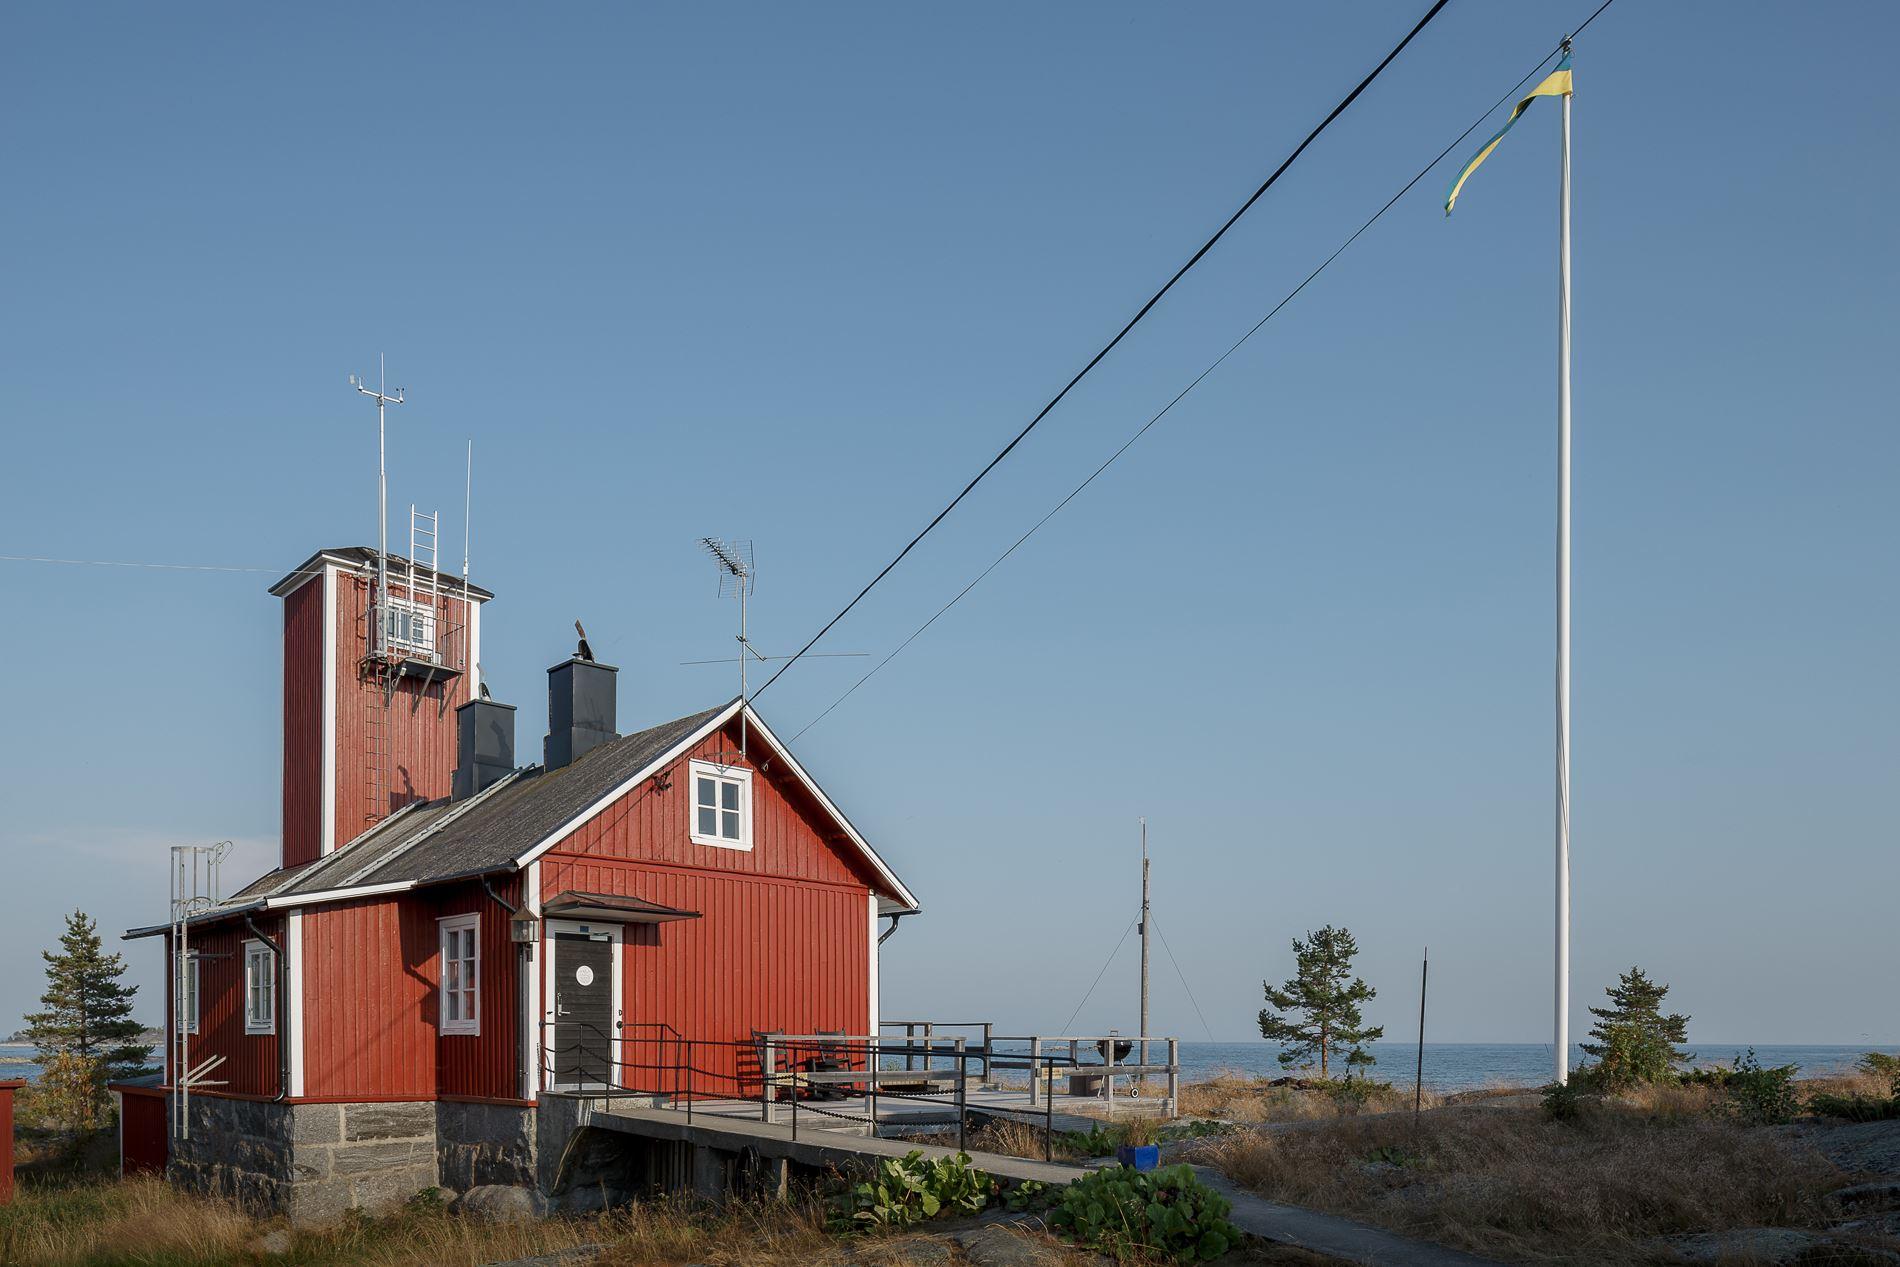 Andreas Nilsson,  © Lotshuset, Vandrarhem vid havet. Järnäsklubb